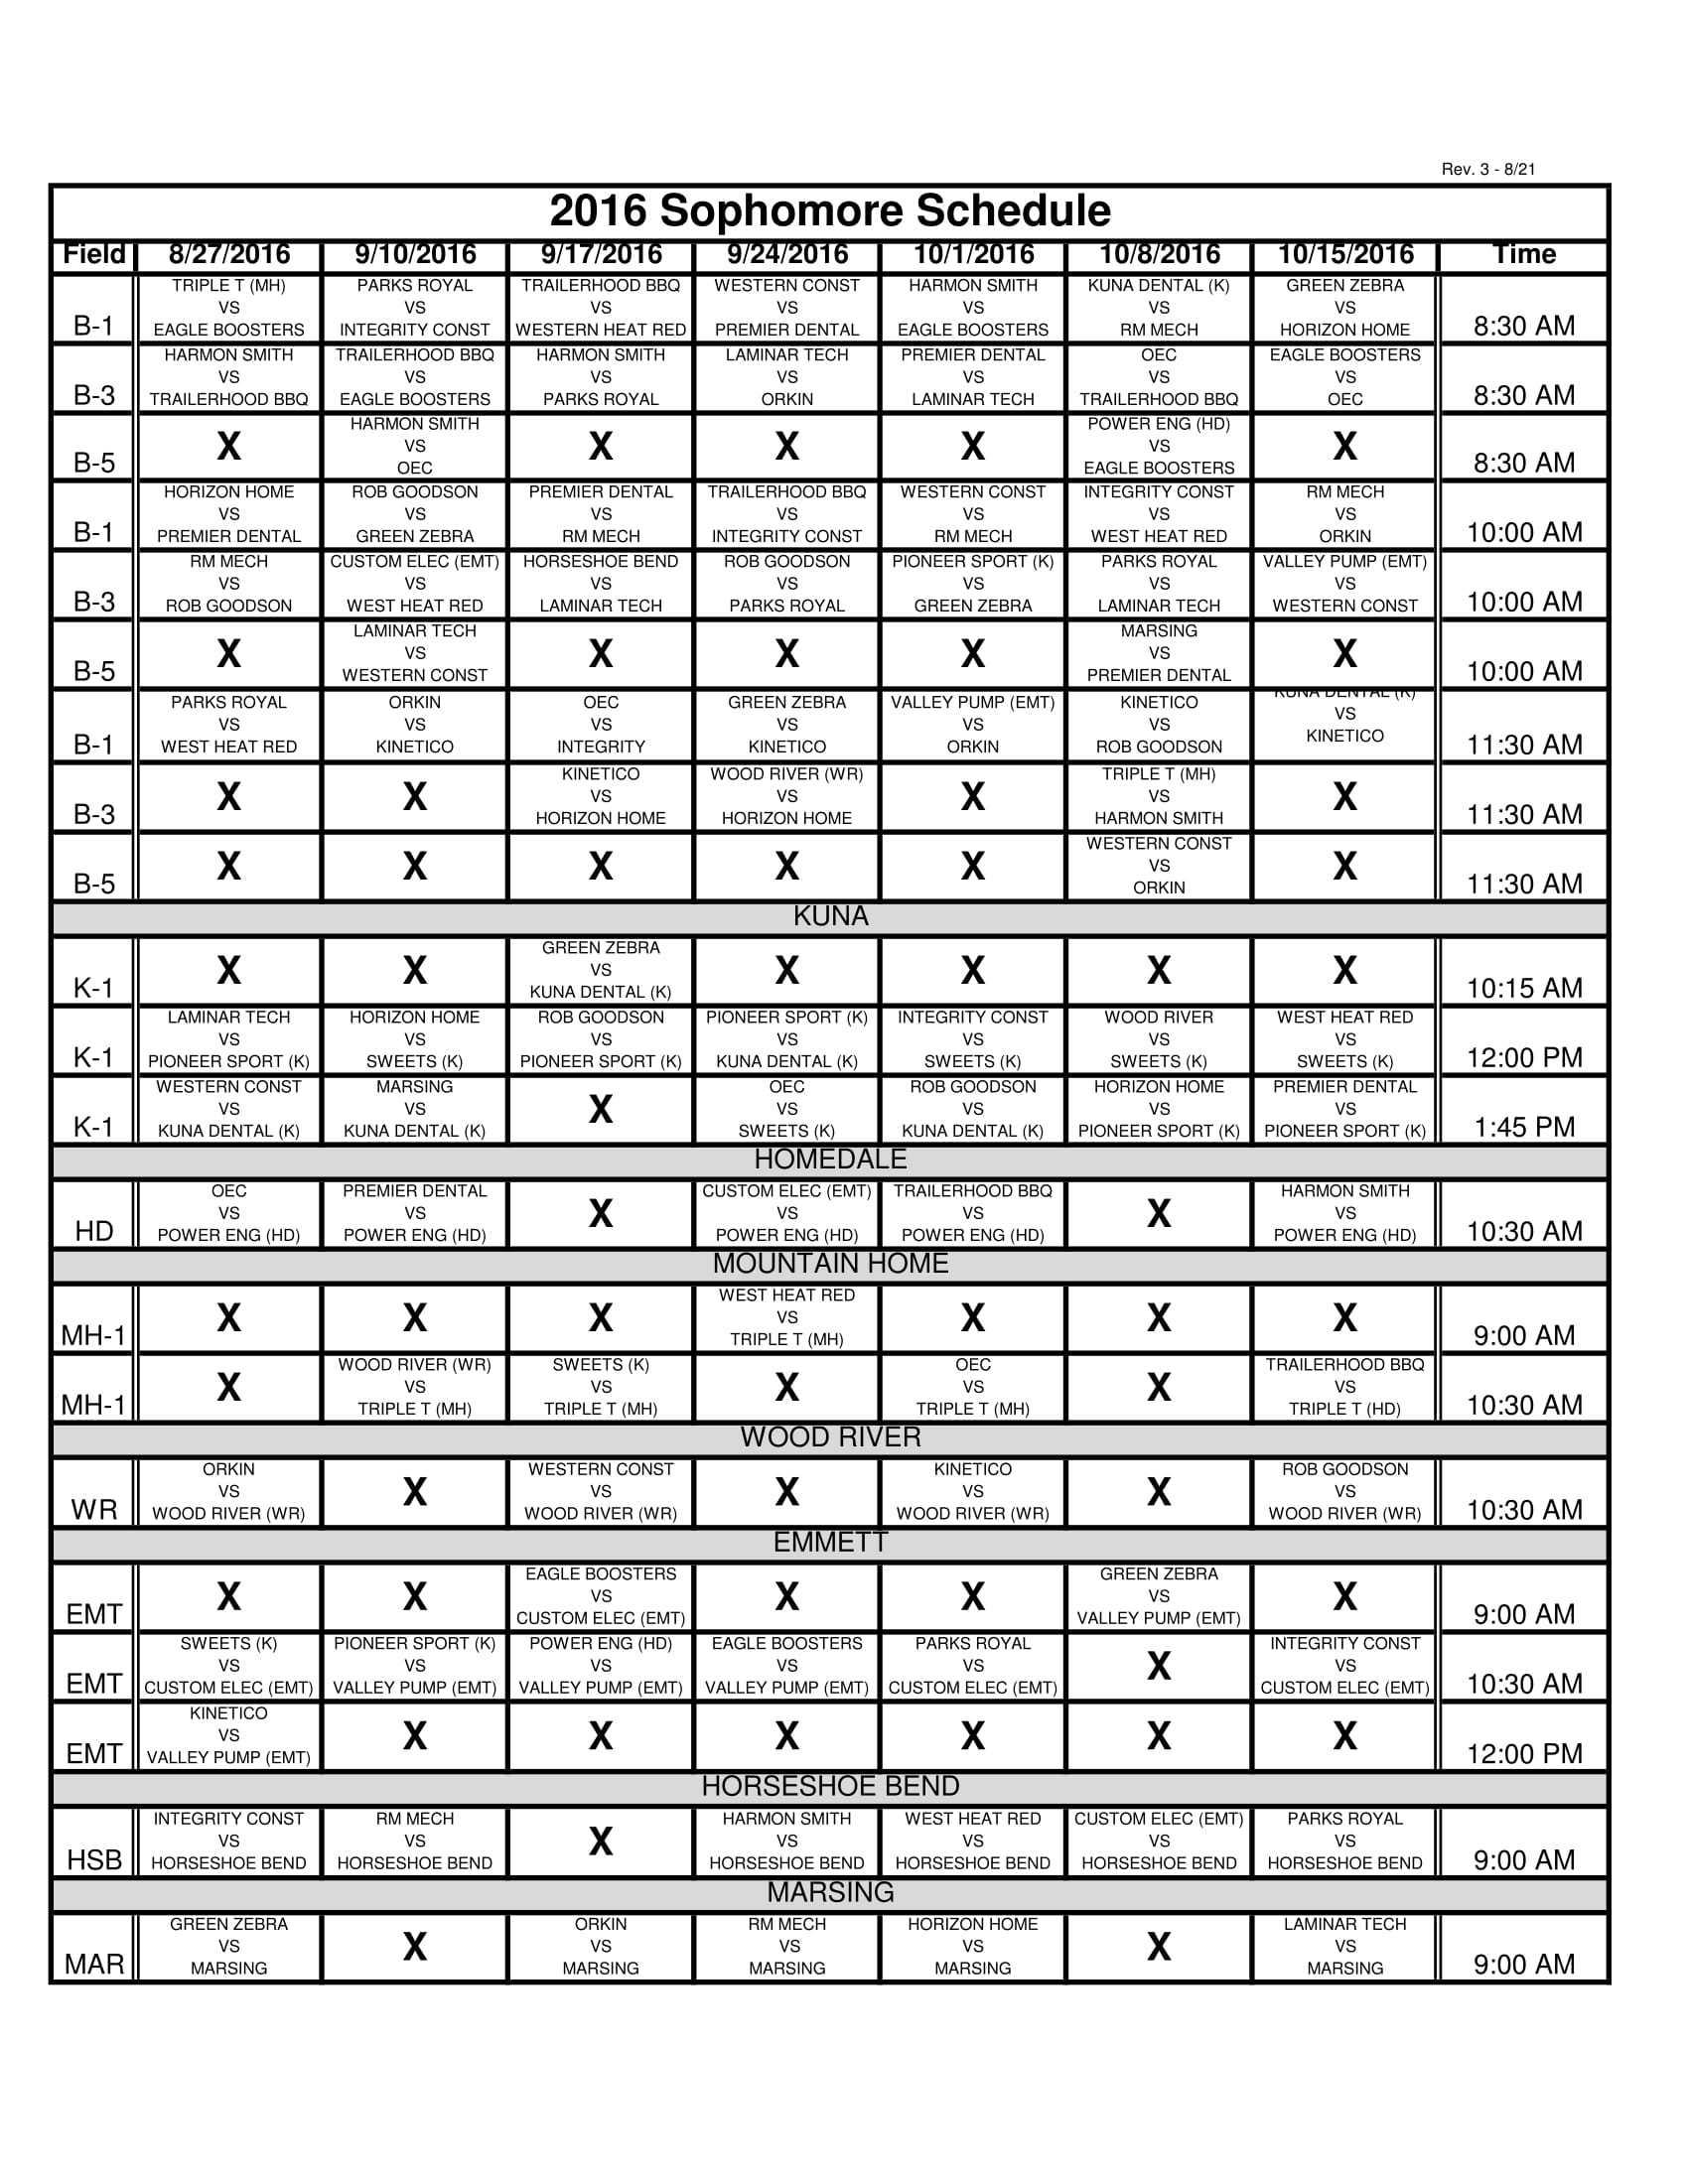 2016-Sophomore-League-final-schedule-8-2